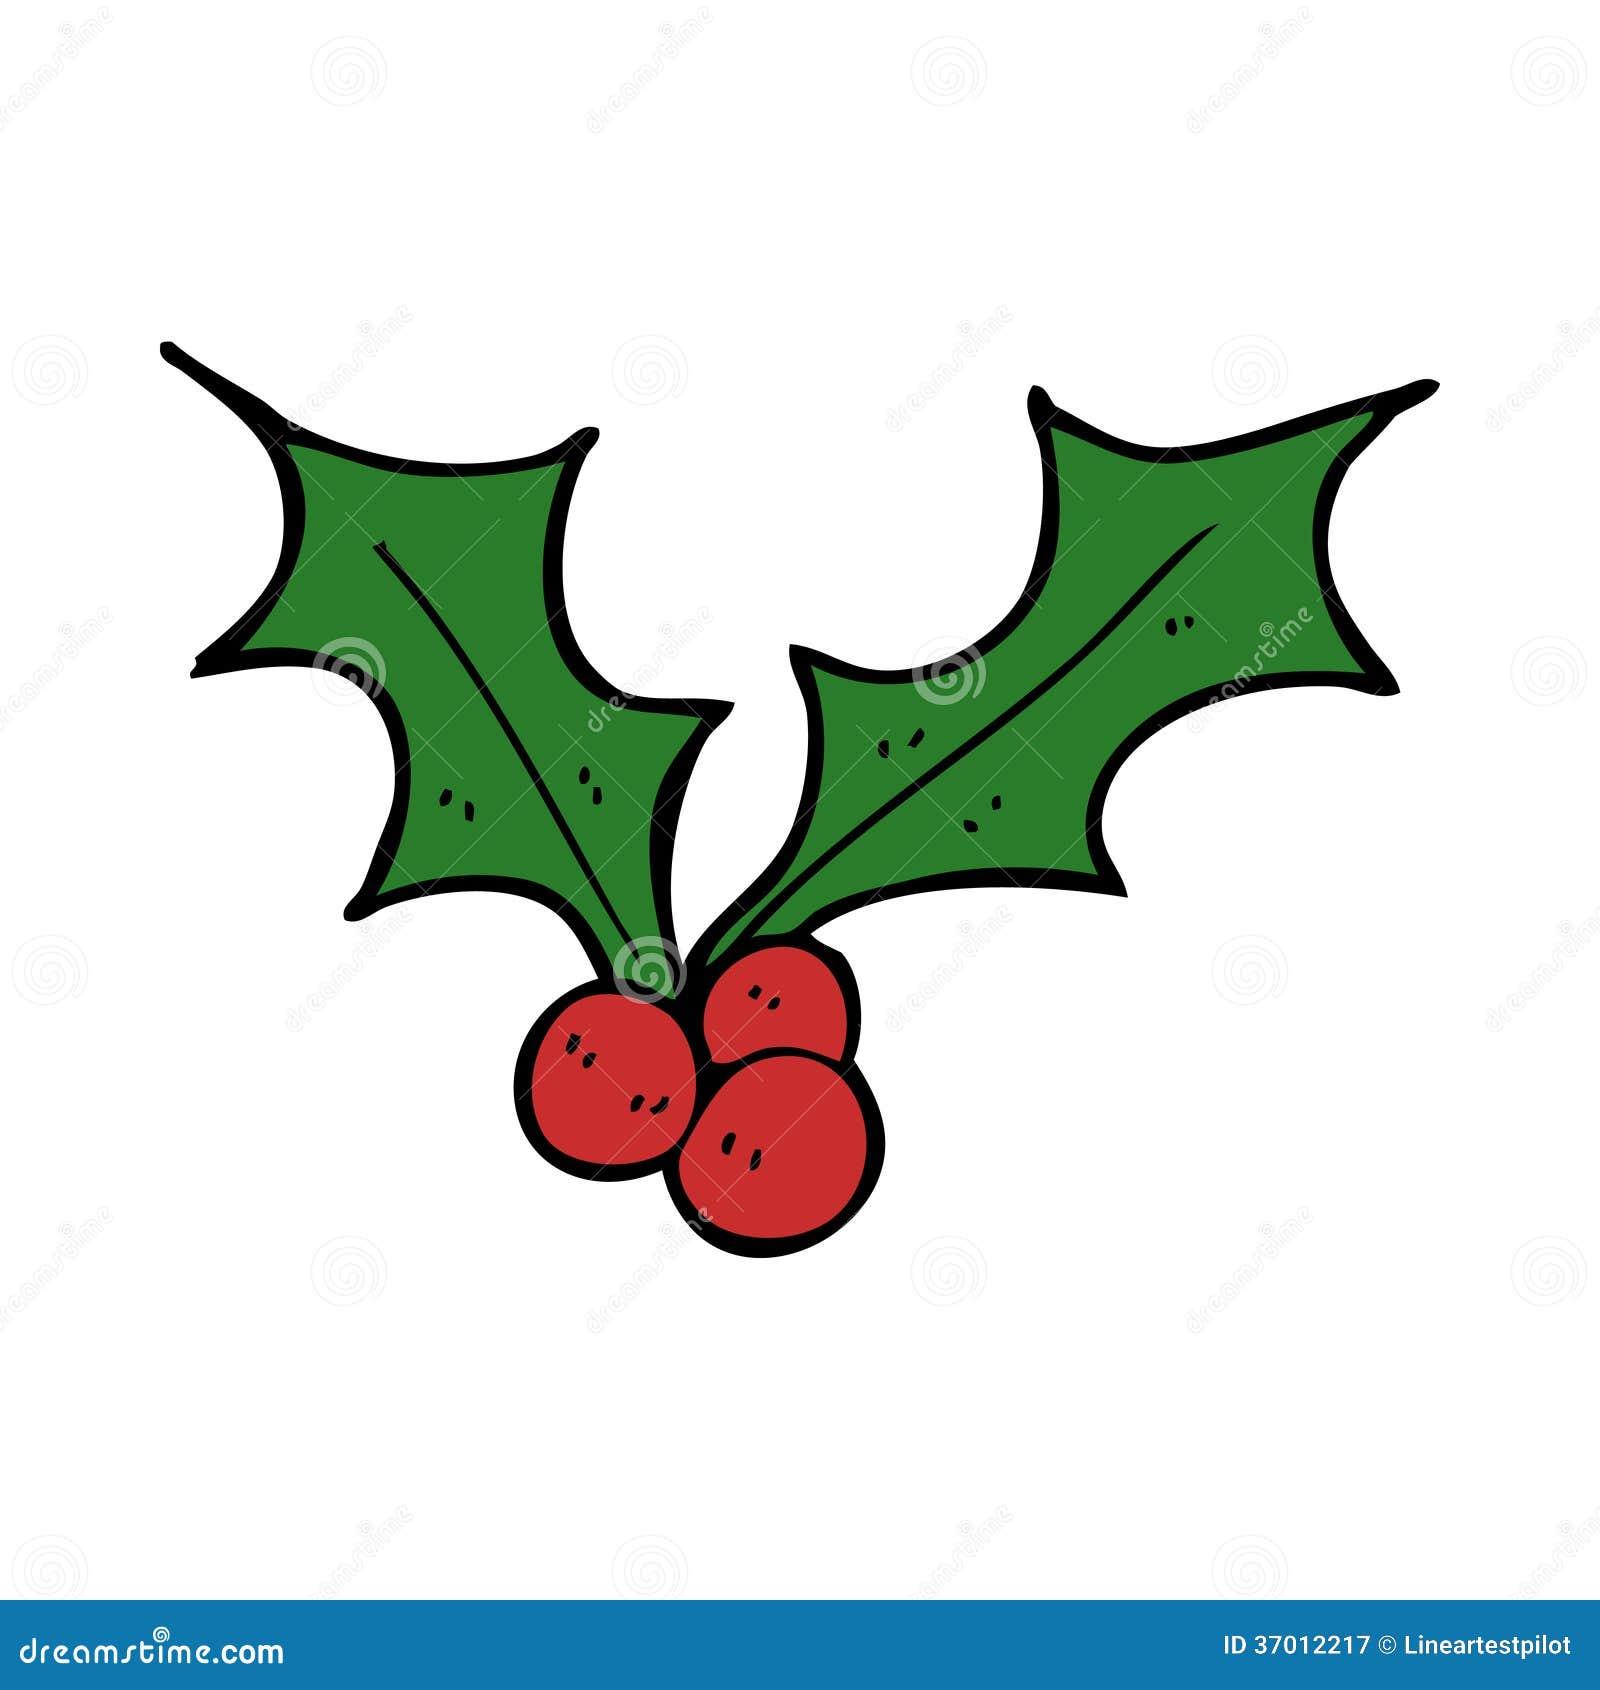 cartoon christmas holly royalty free stock photography christmas holly clipart svg christmas holly clip art border